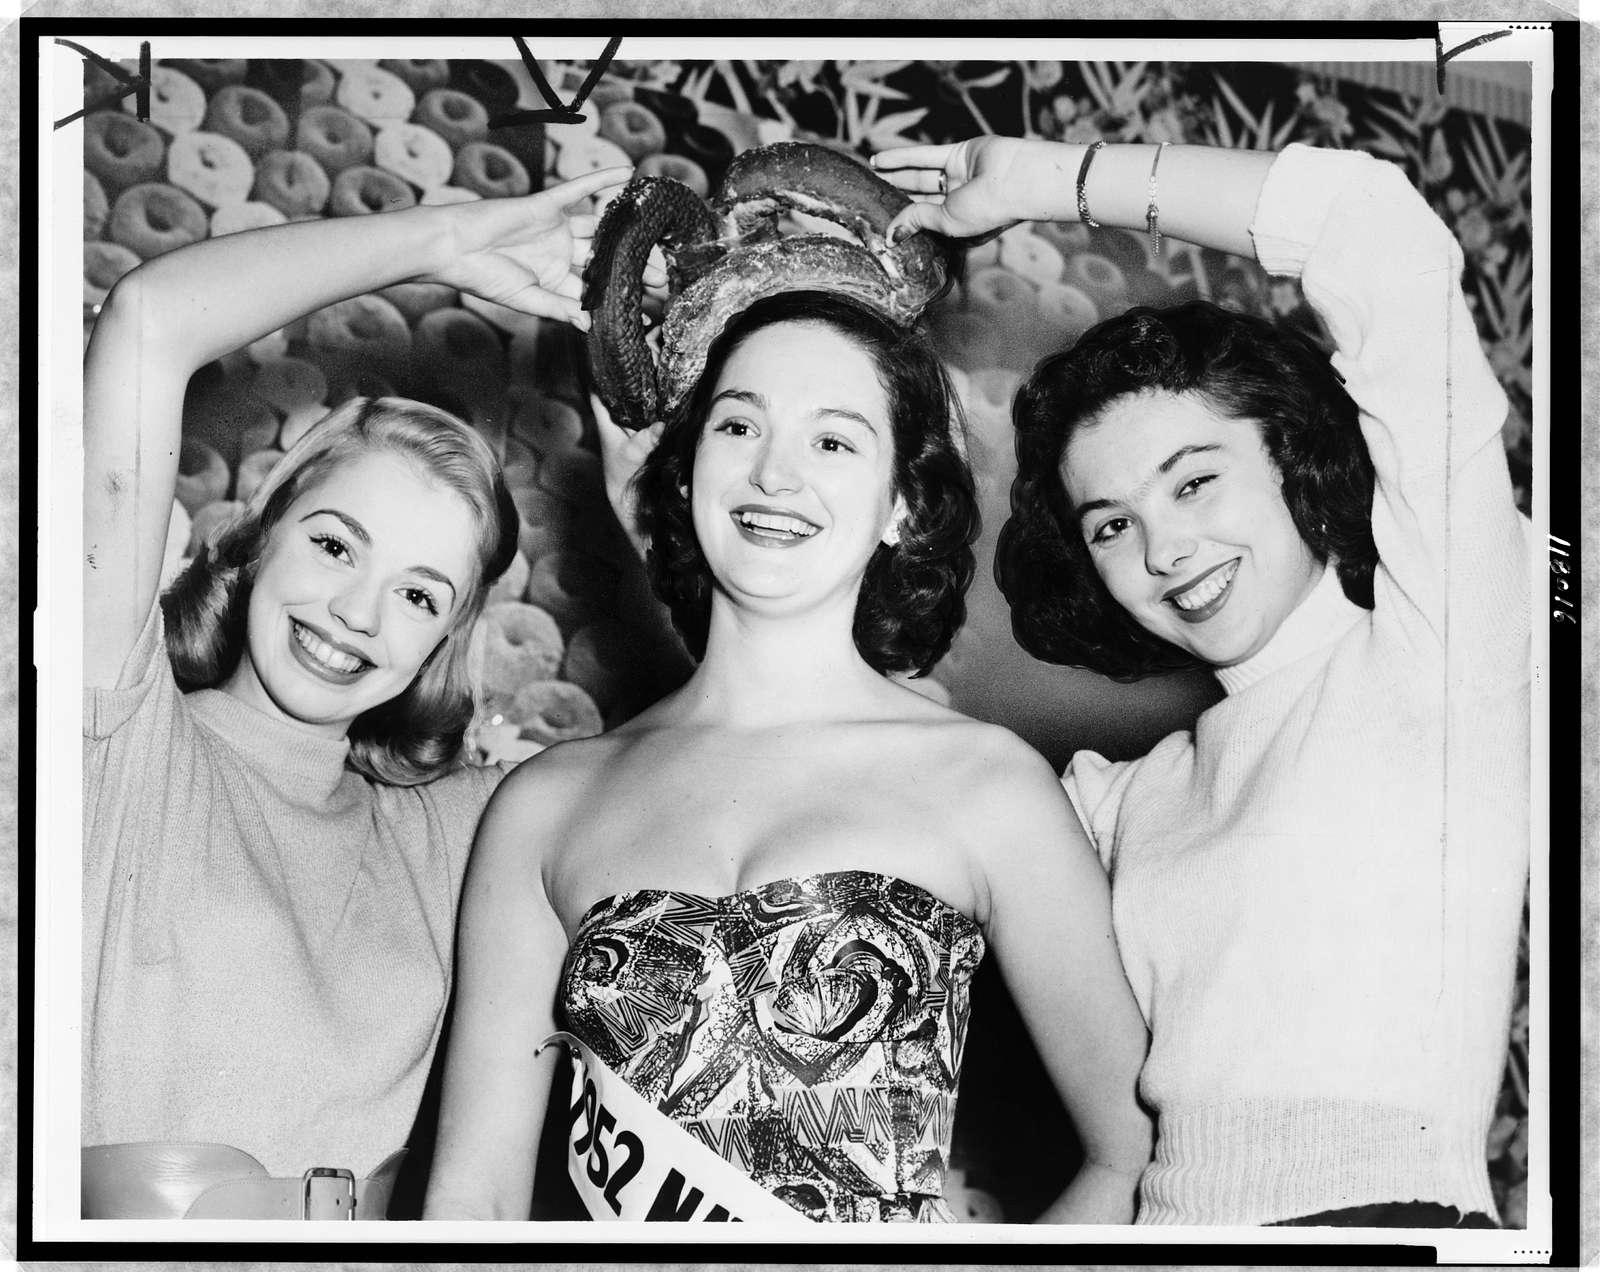 [Diane Scholen, left, and Pat Kizeminski, right (runners-up) place doughnut crown on Nancy Templeton, National Doughnut Queen] / World Telegram & Sun photo by Fred Palumbo.